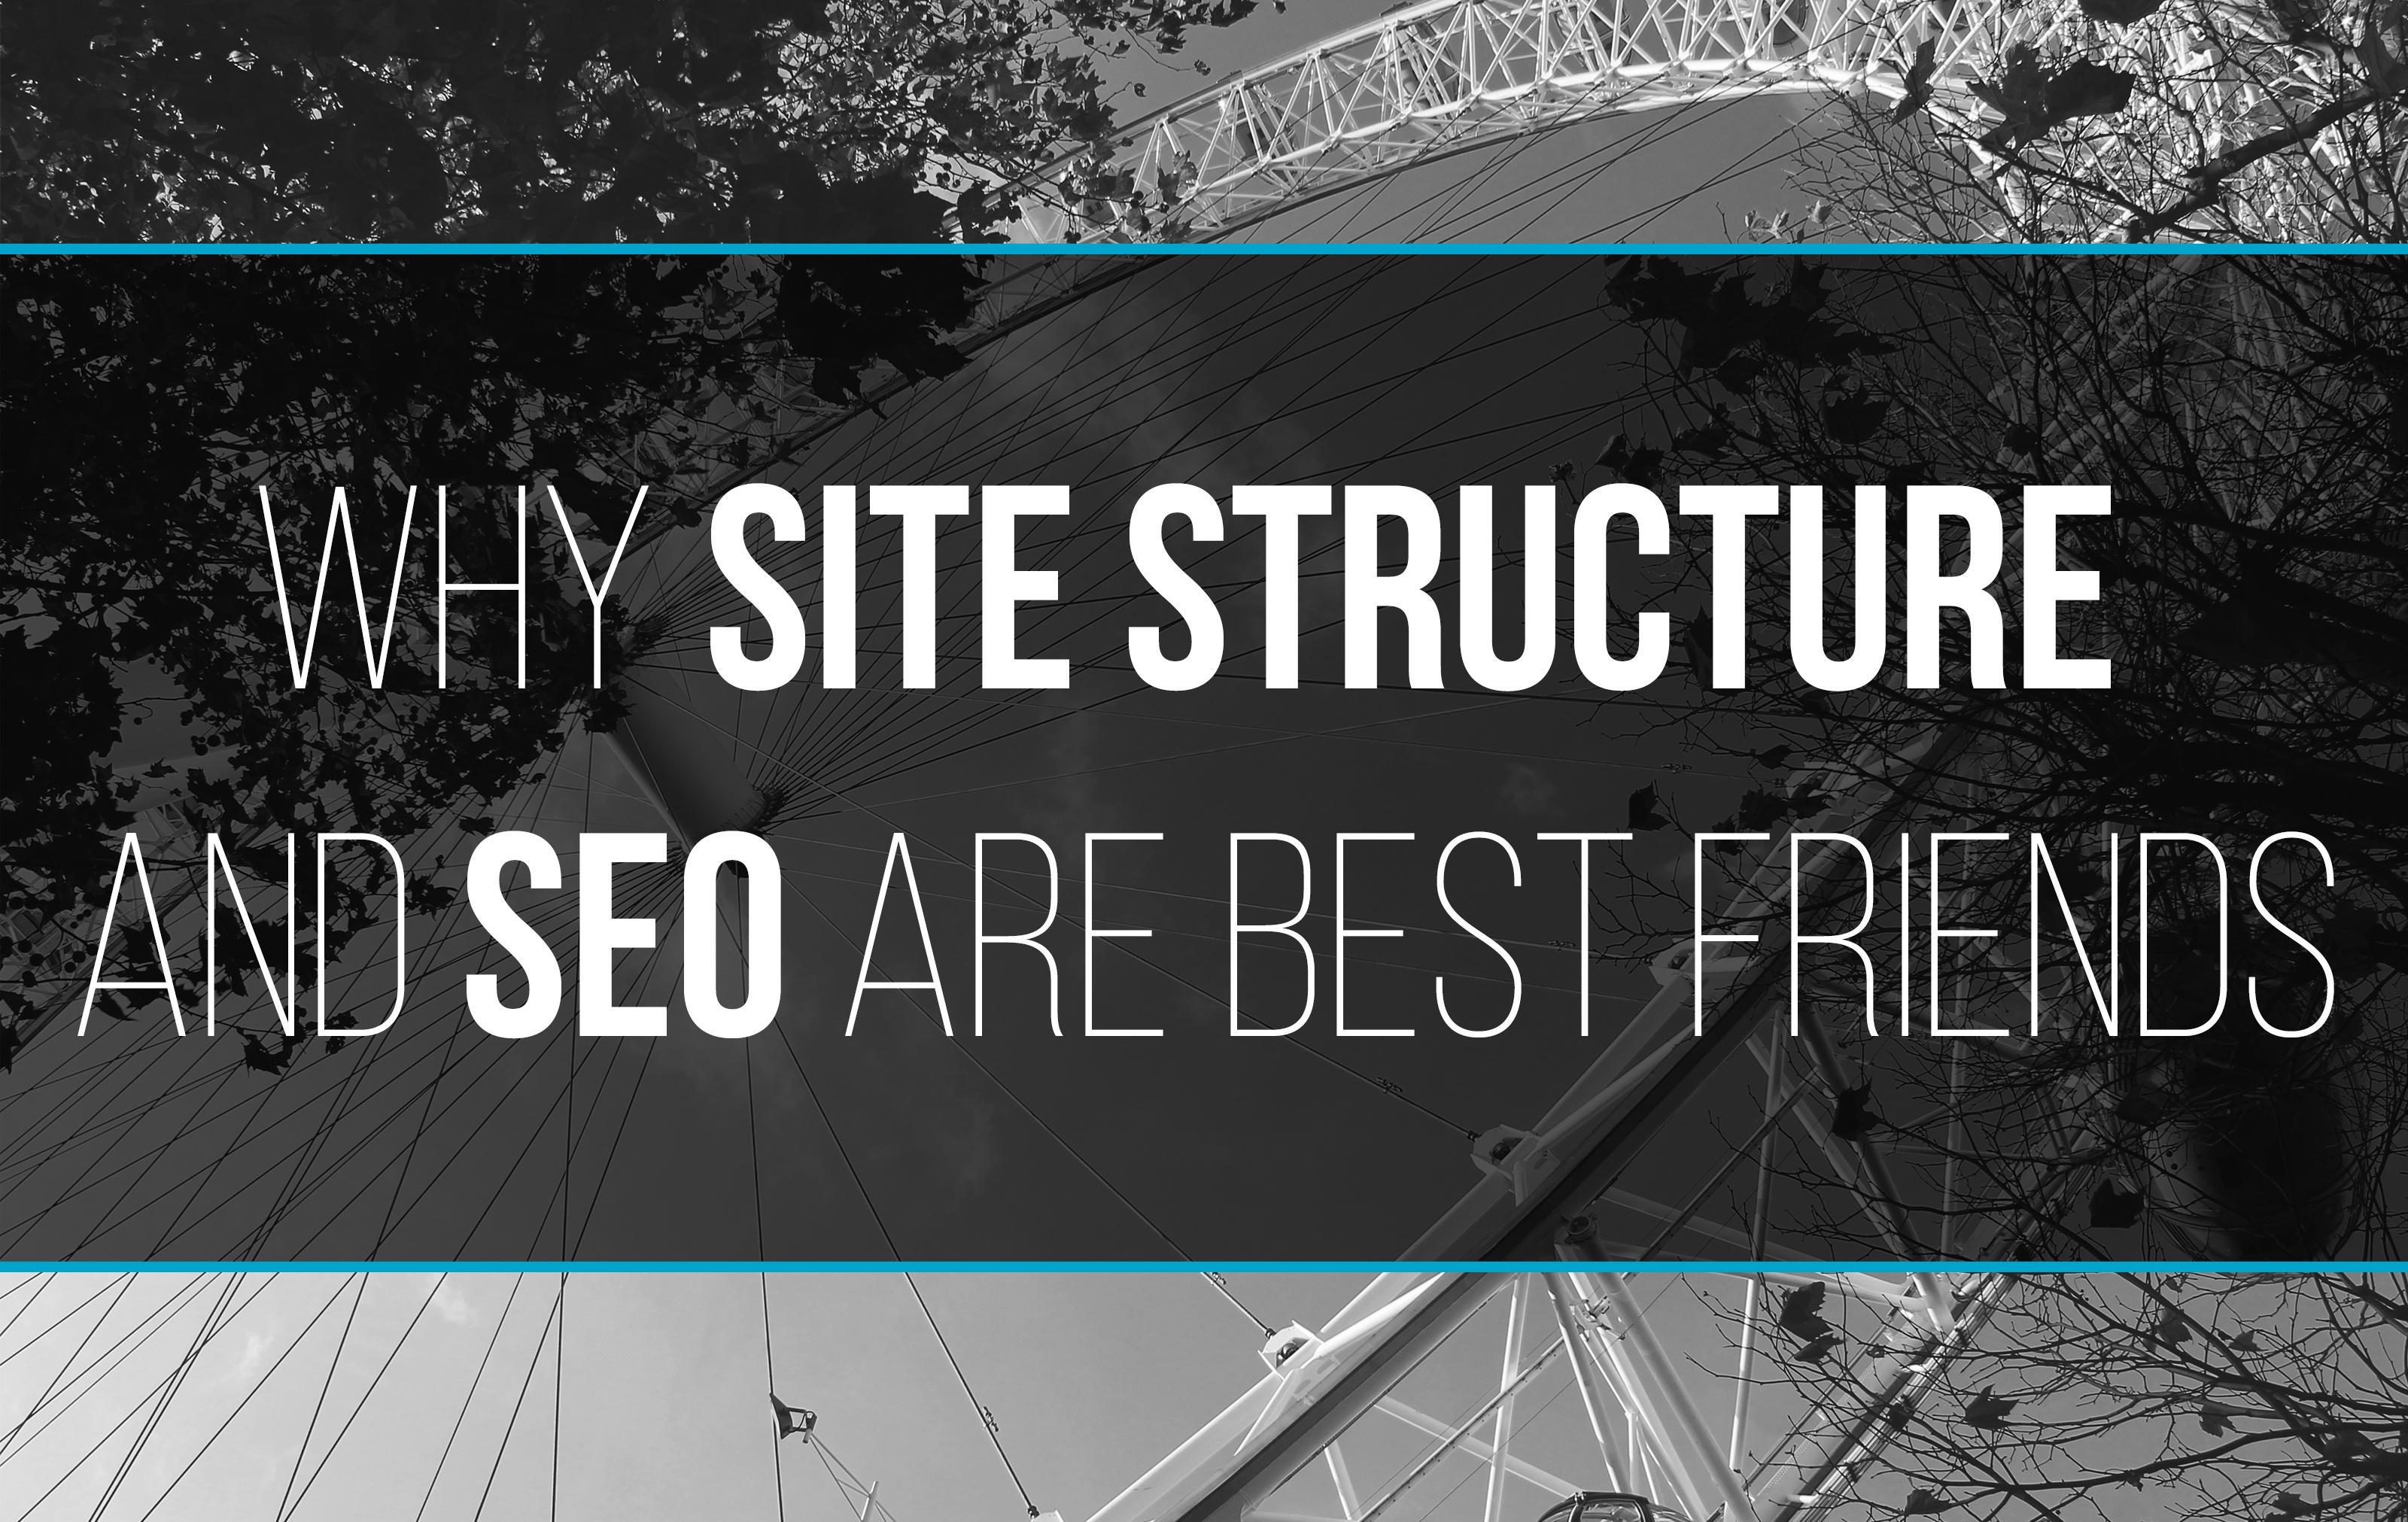 Site_Structure__SEO.jpg